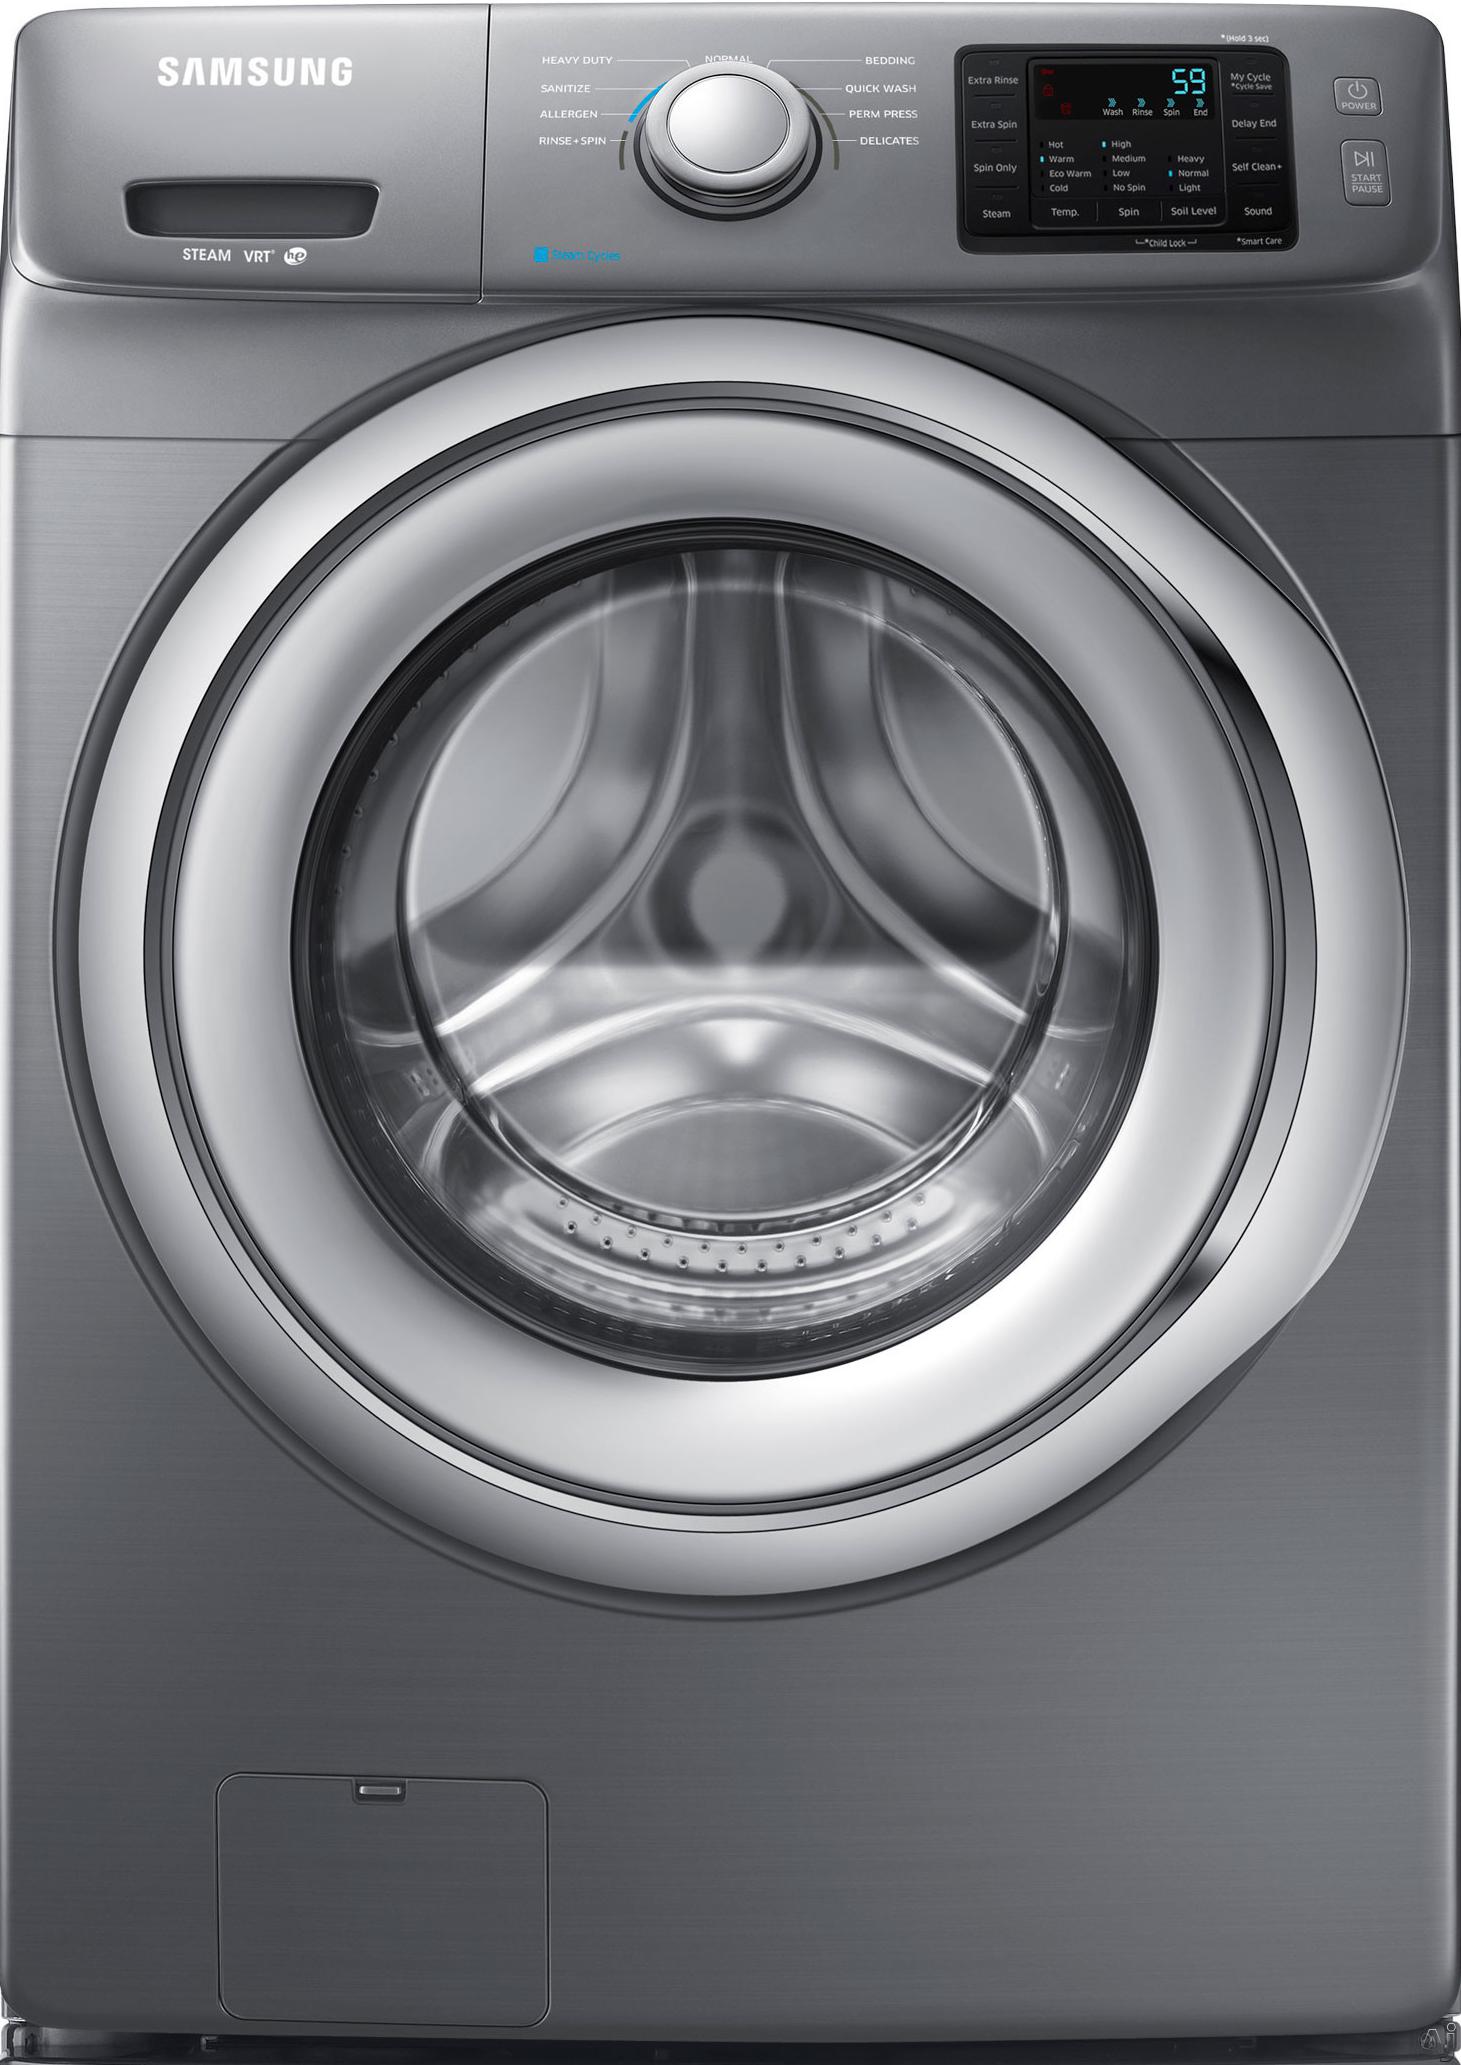 Samsung Laundry,Samsung Washers,Samsung Front Load (Tumble)